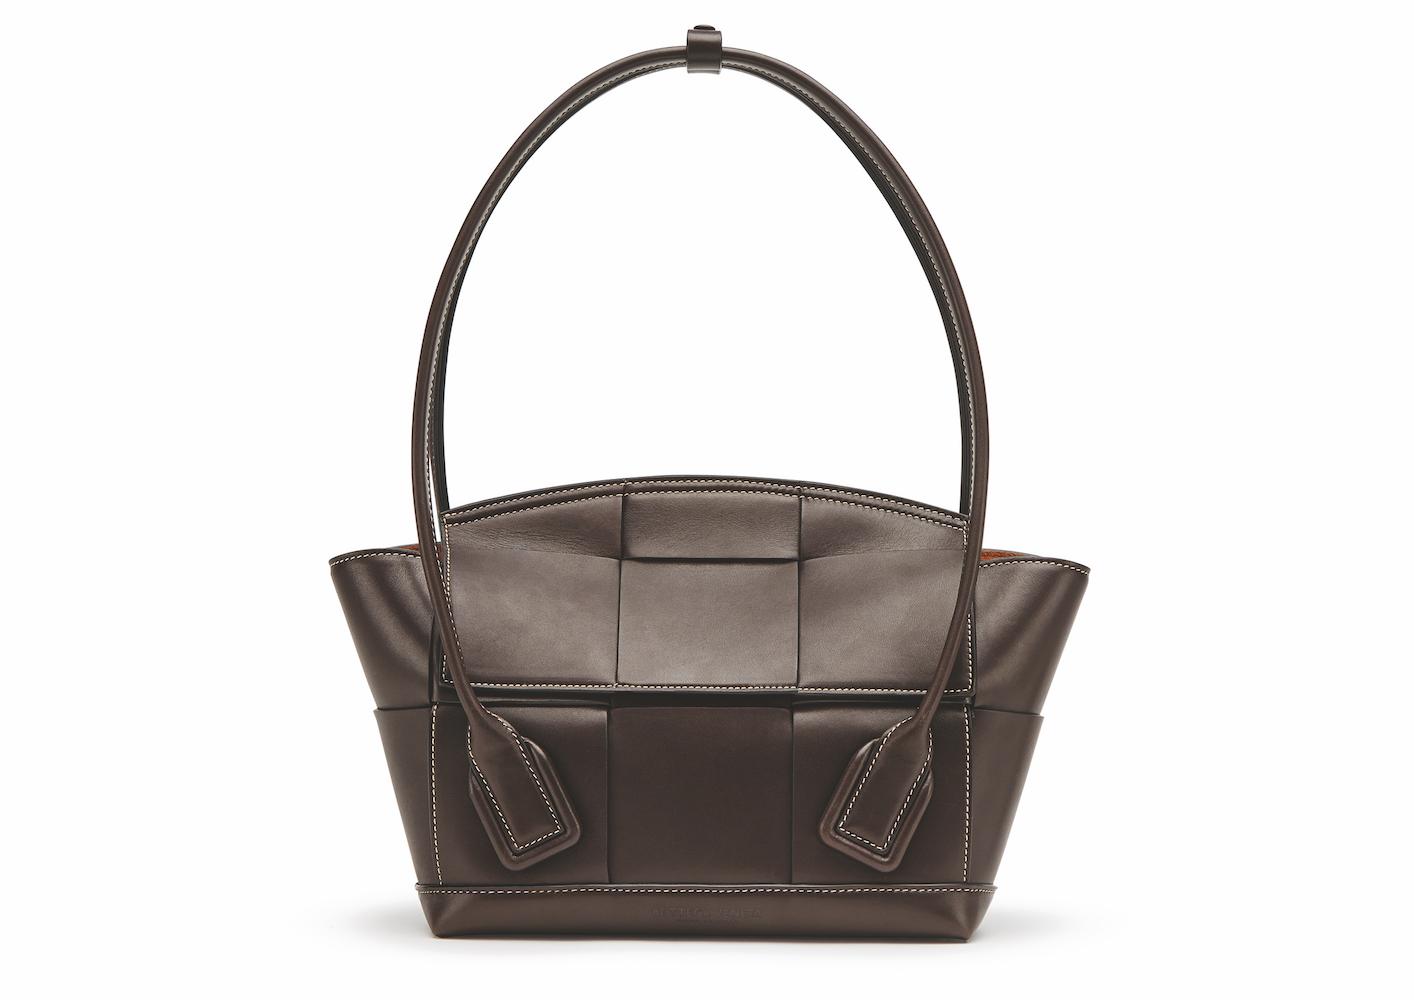 Bottega Veneta The Arco Bag (3).jpg